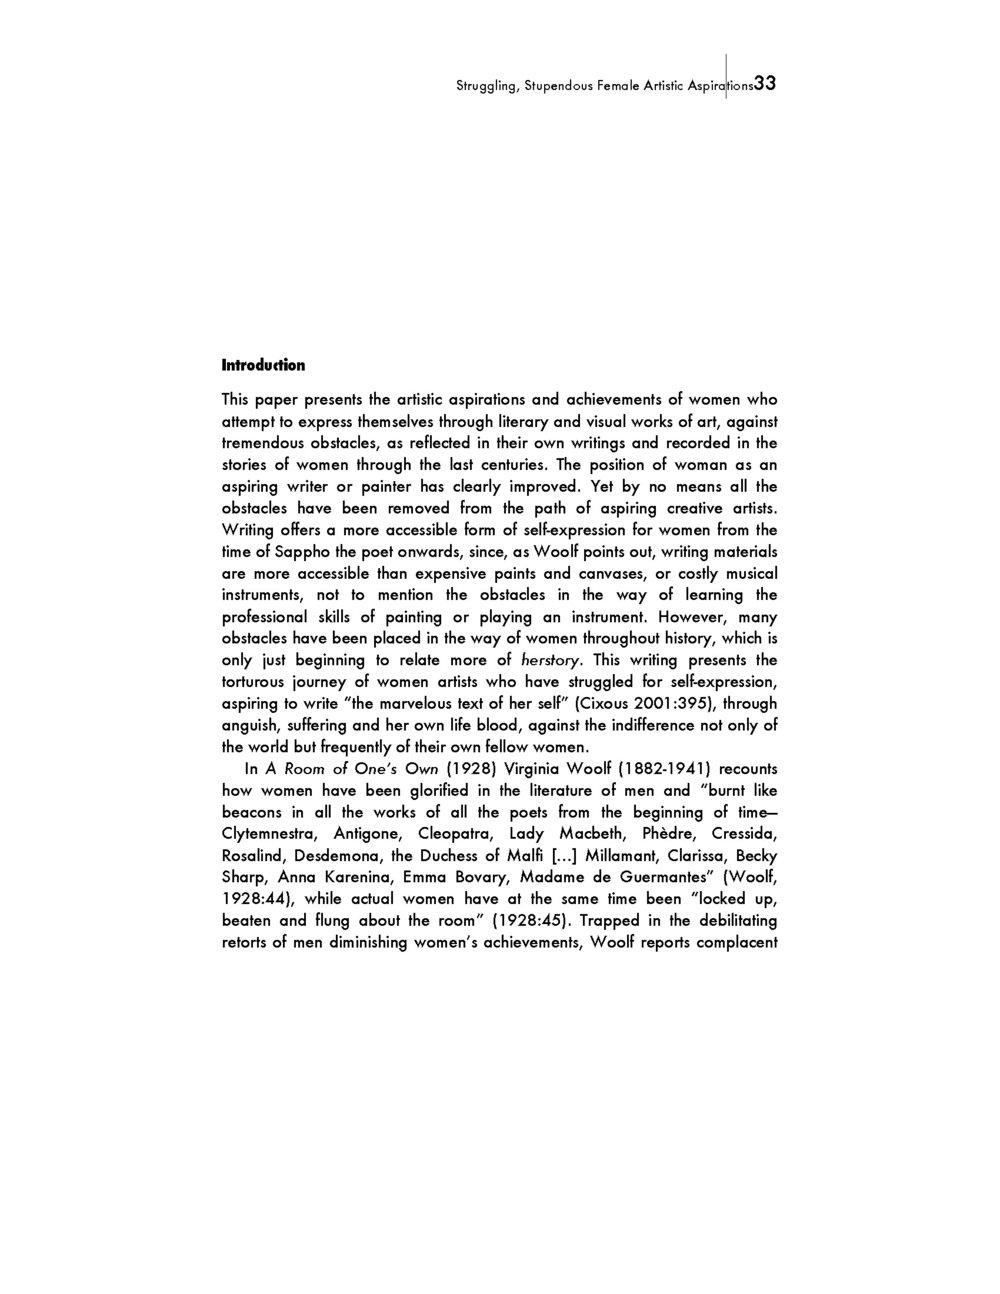 StrugglingStupendousFemalep31_Page_03.jpg